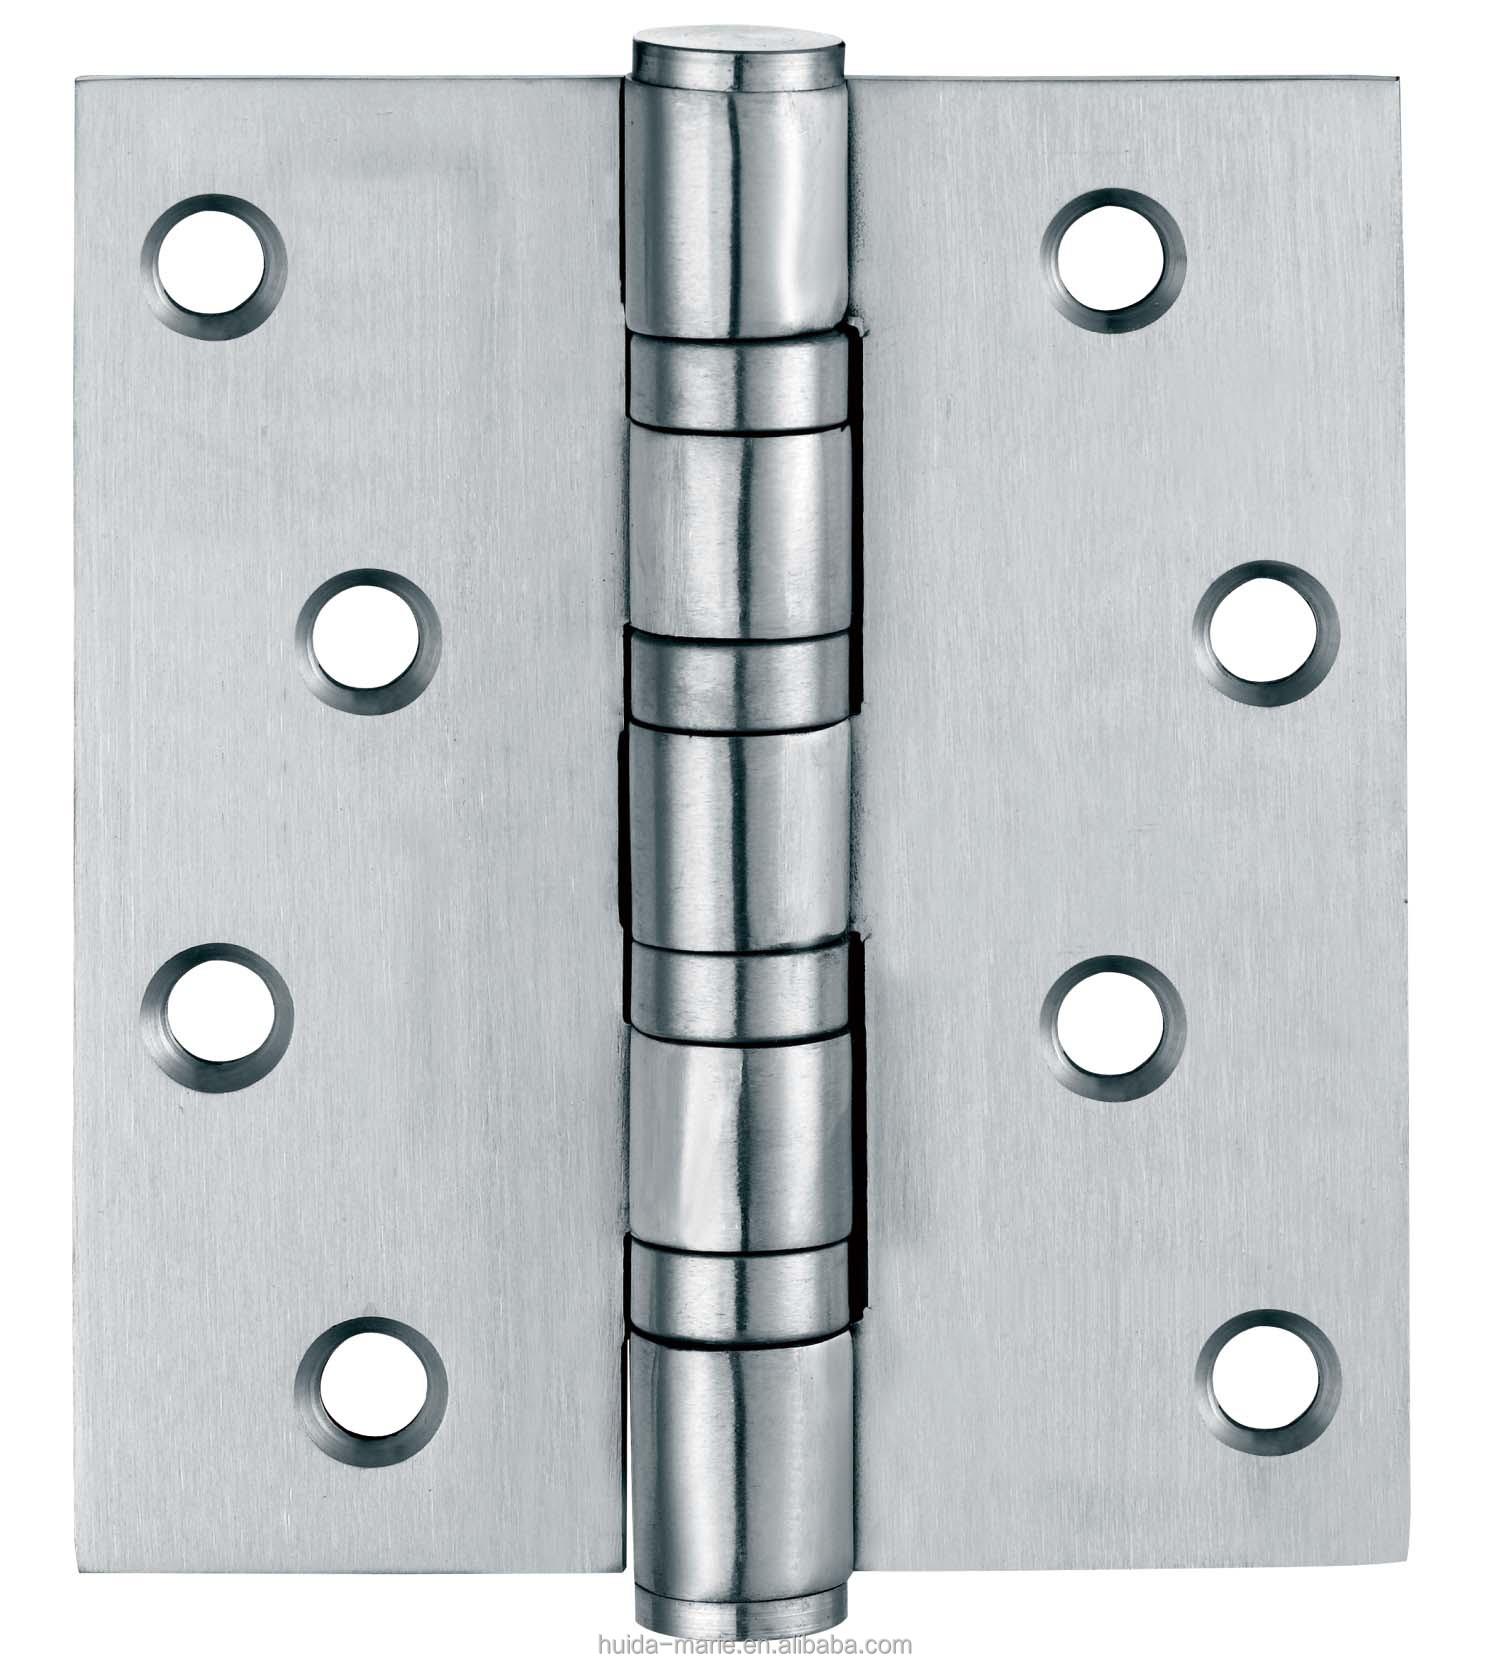 6 Quot Hafele Stainless Steel Hinge Door Hinge Ball Bearing